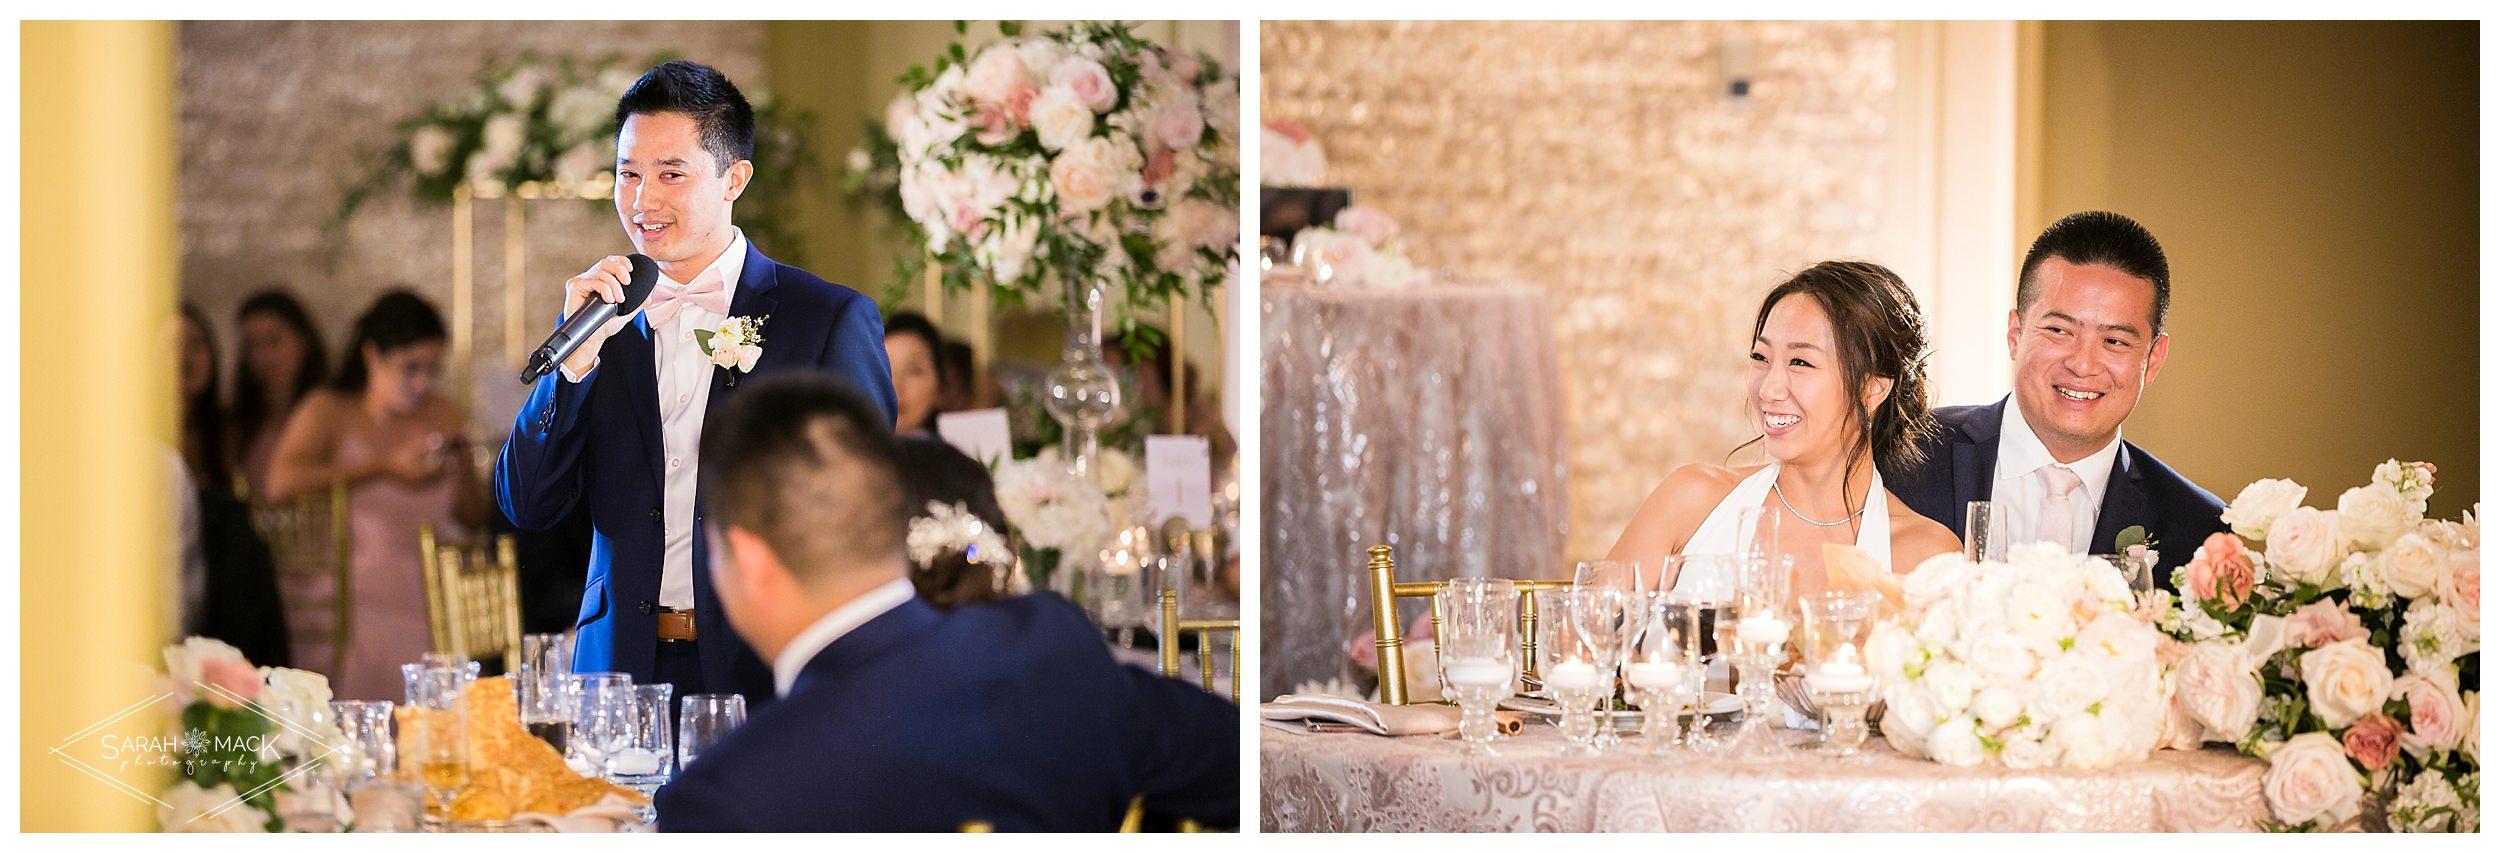 CJ-Ritz-Carlton-Laguna-Beach-Wedding-Photography-0259.jpg